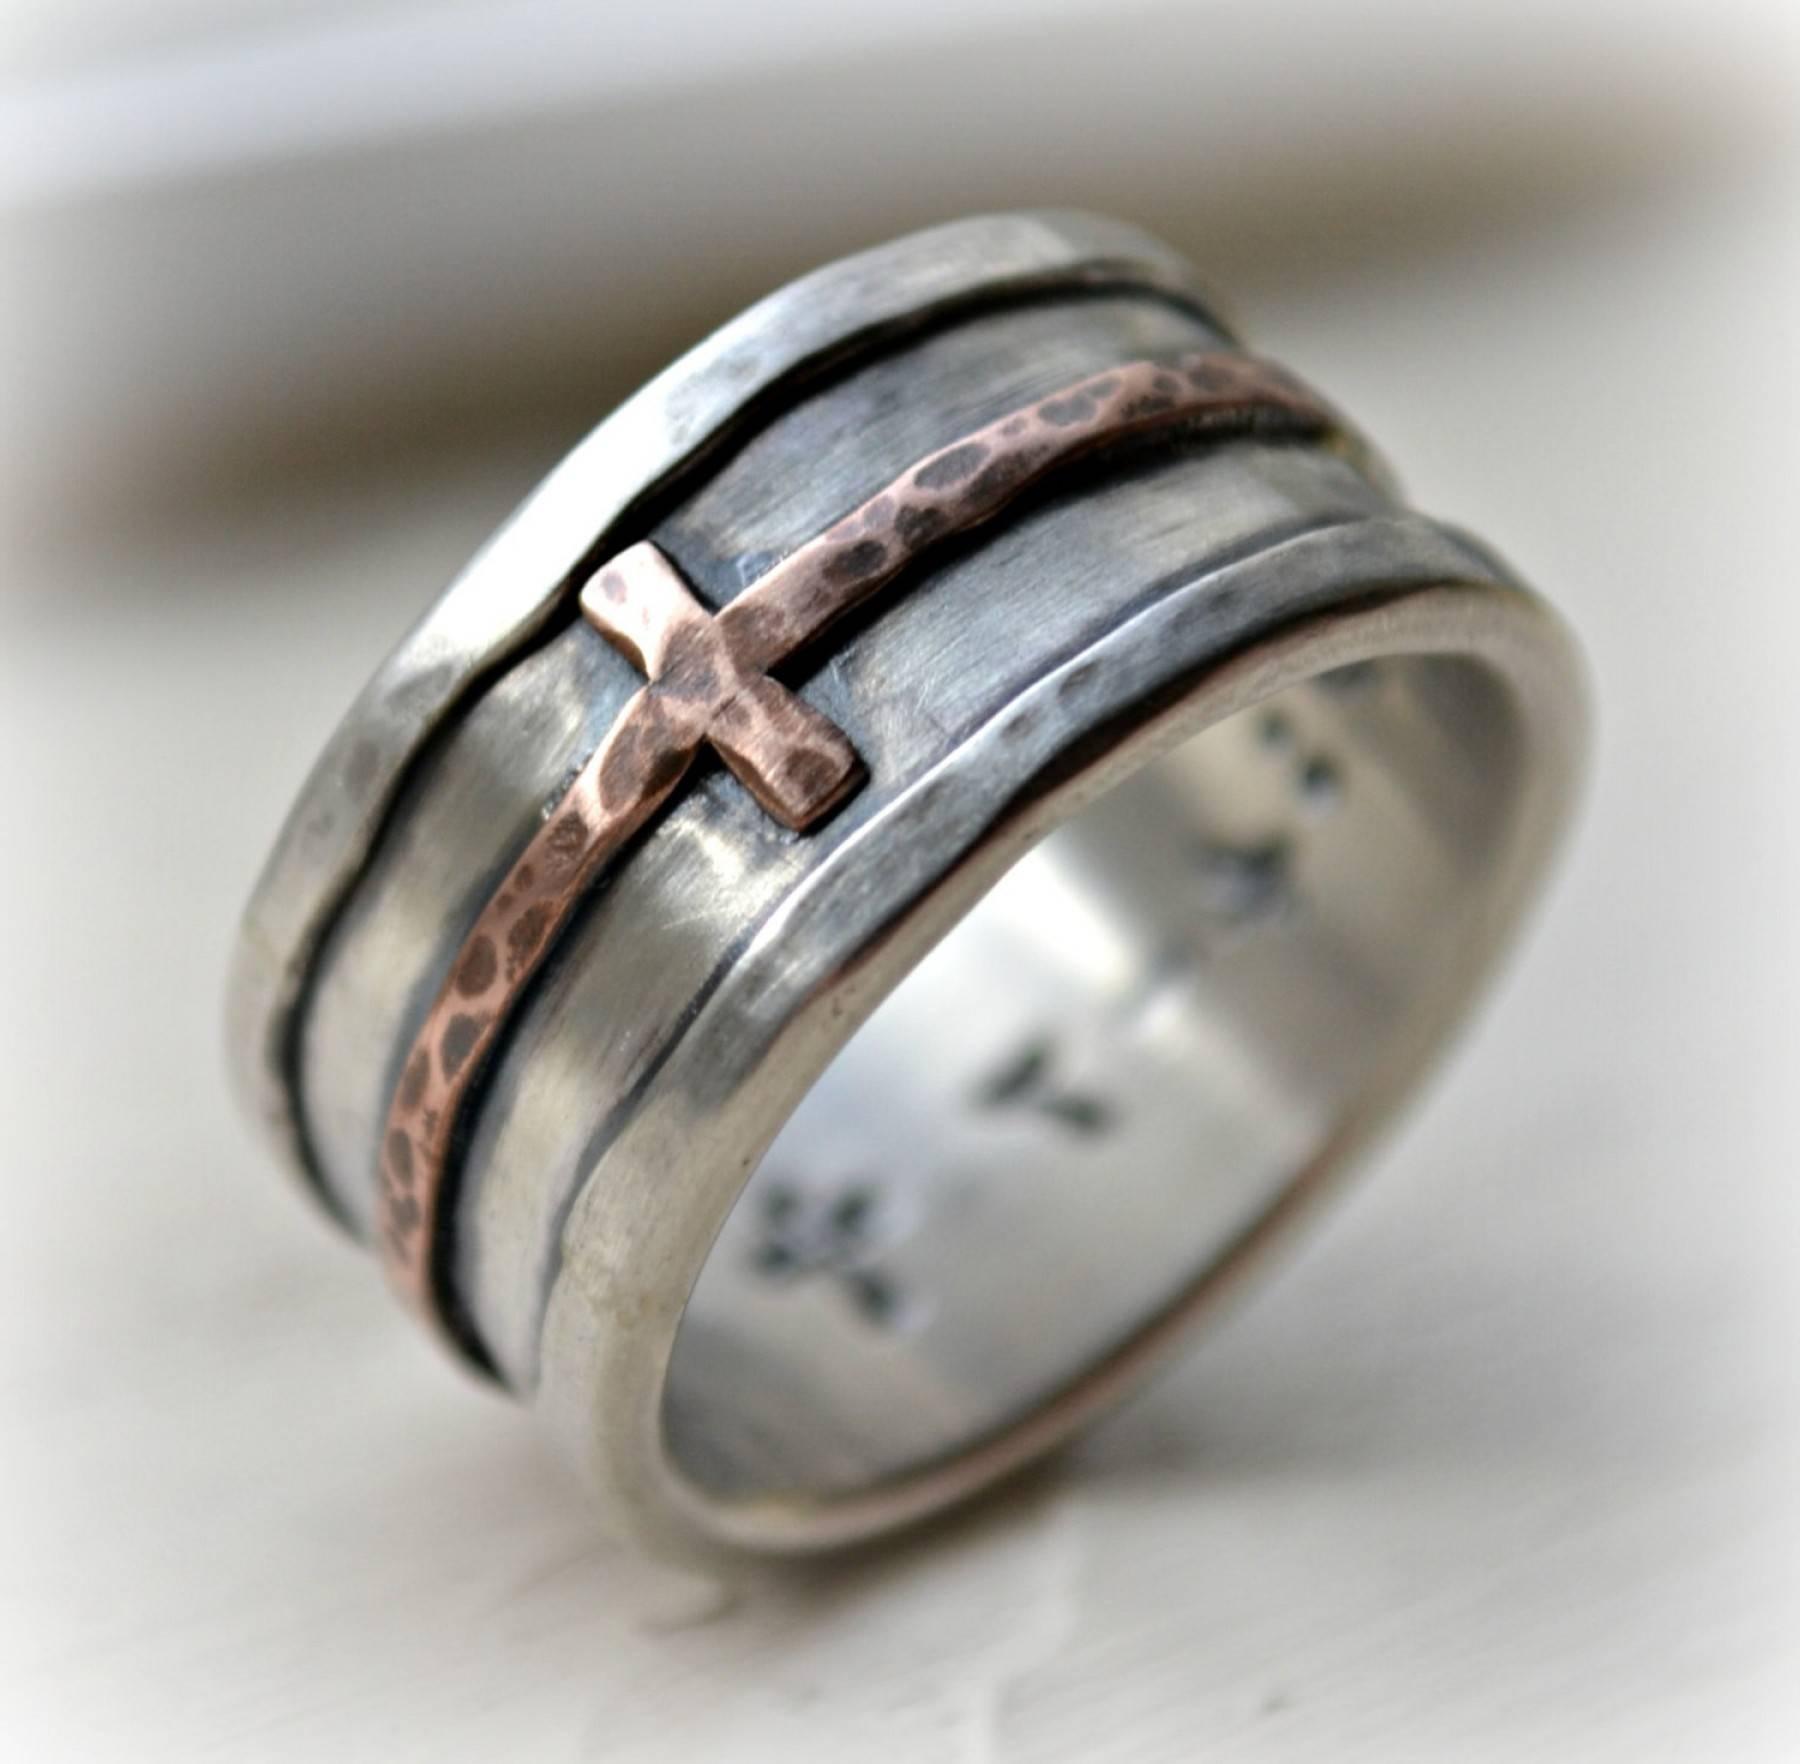 scottish wedding rings for men new mens titanium camo wedding inside mens scottish wedding bands - Mens Camo Wedding Ring